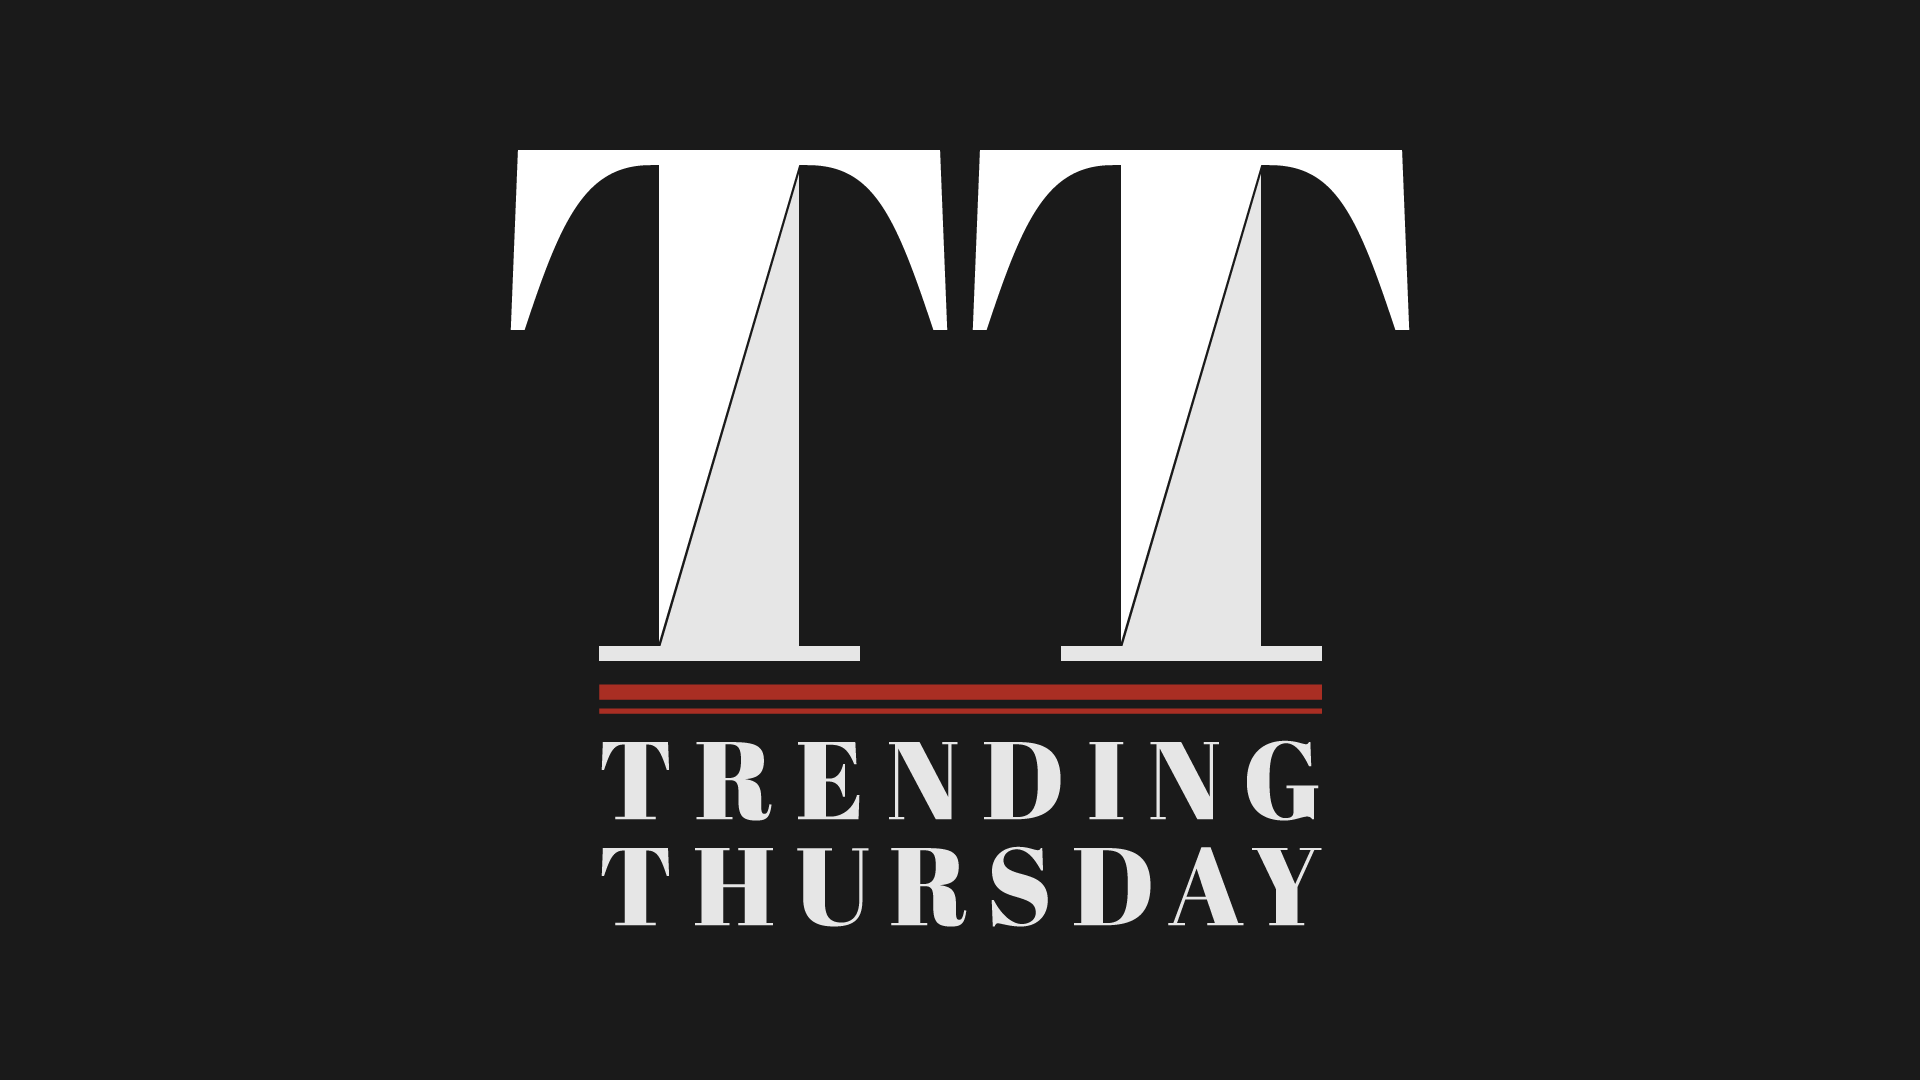 Trending Thursday: Creative Marketing Ideas From a Viral